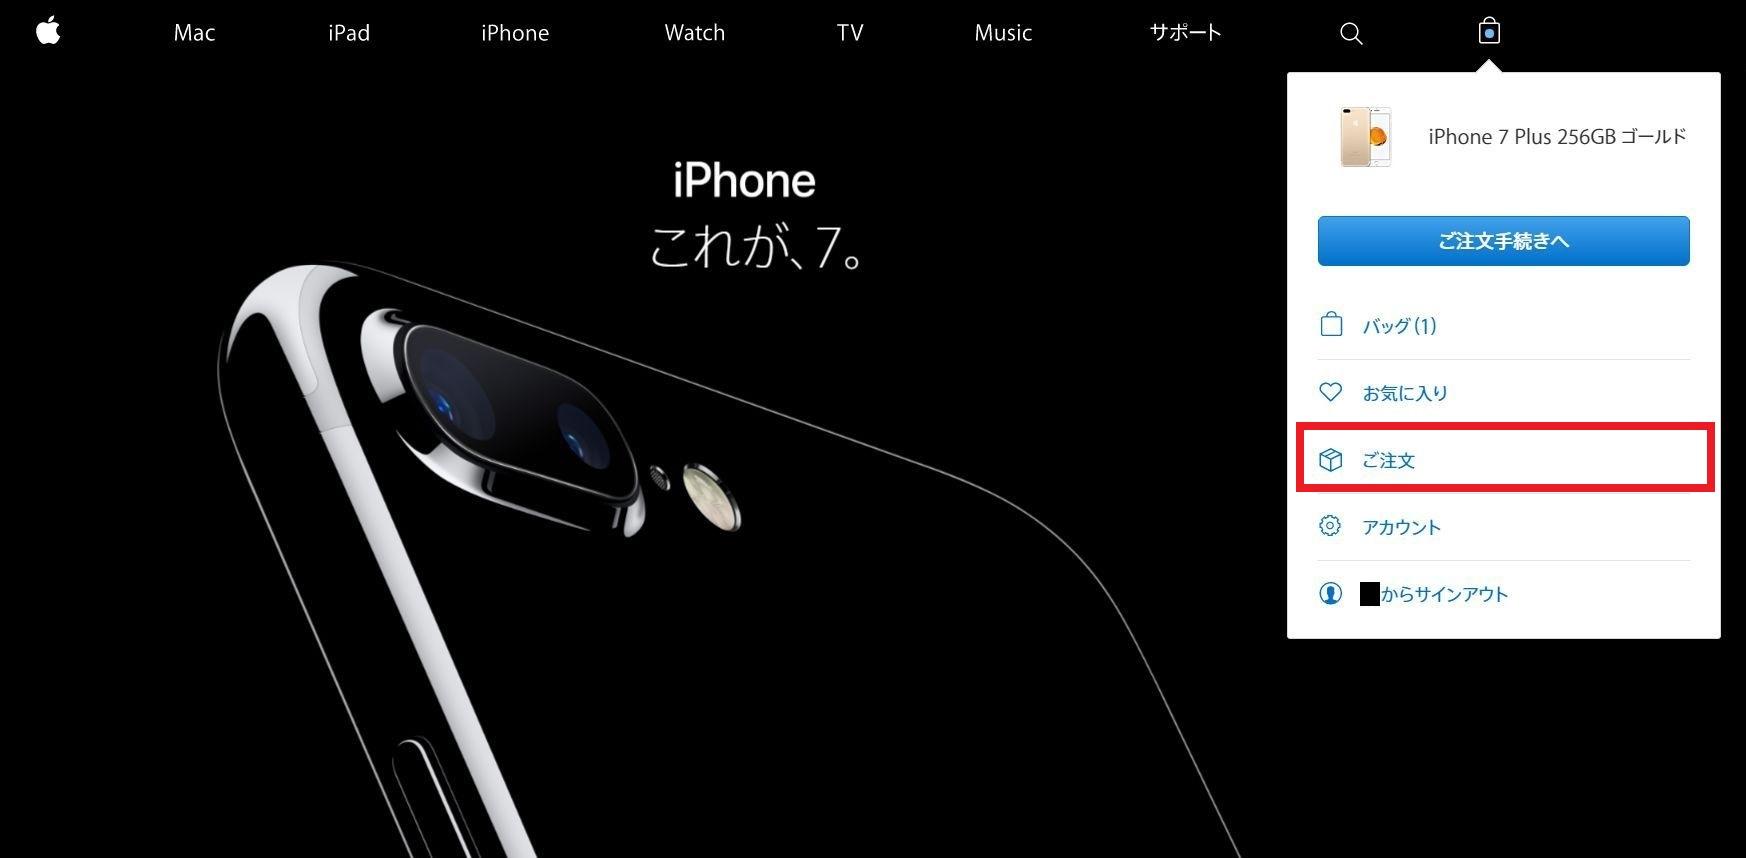 Apple Online Storeのアカウントアイコンをクリック